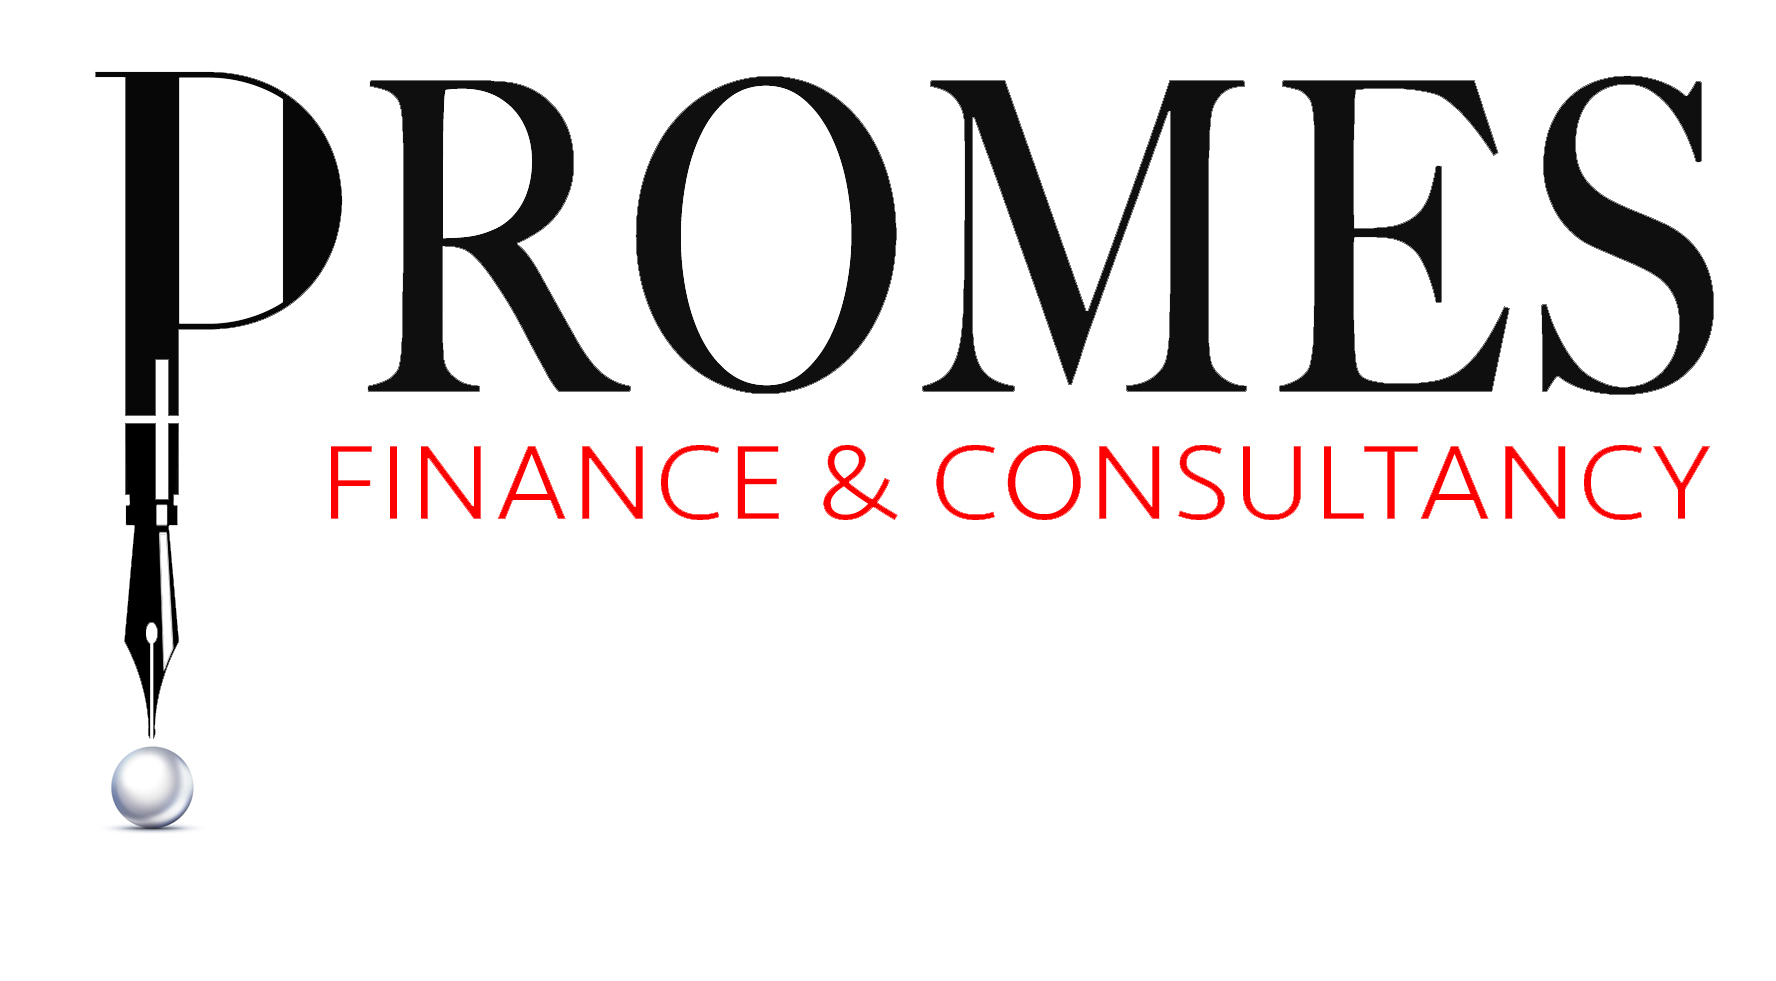 Promes Finance